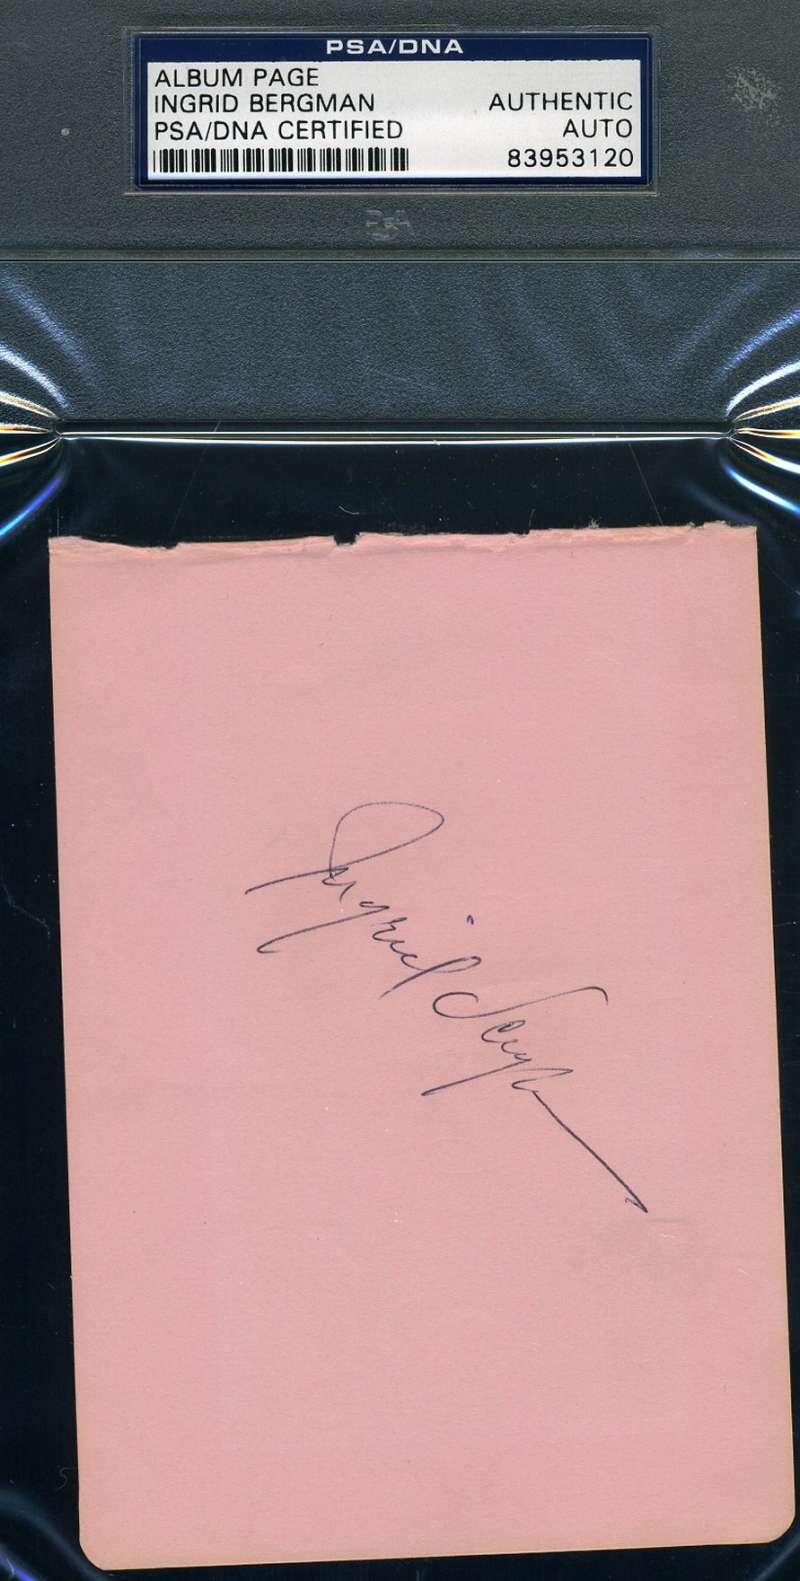 Ingrid Bergman Psa/dna Hand Signed Album Page Authenticated Autograph